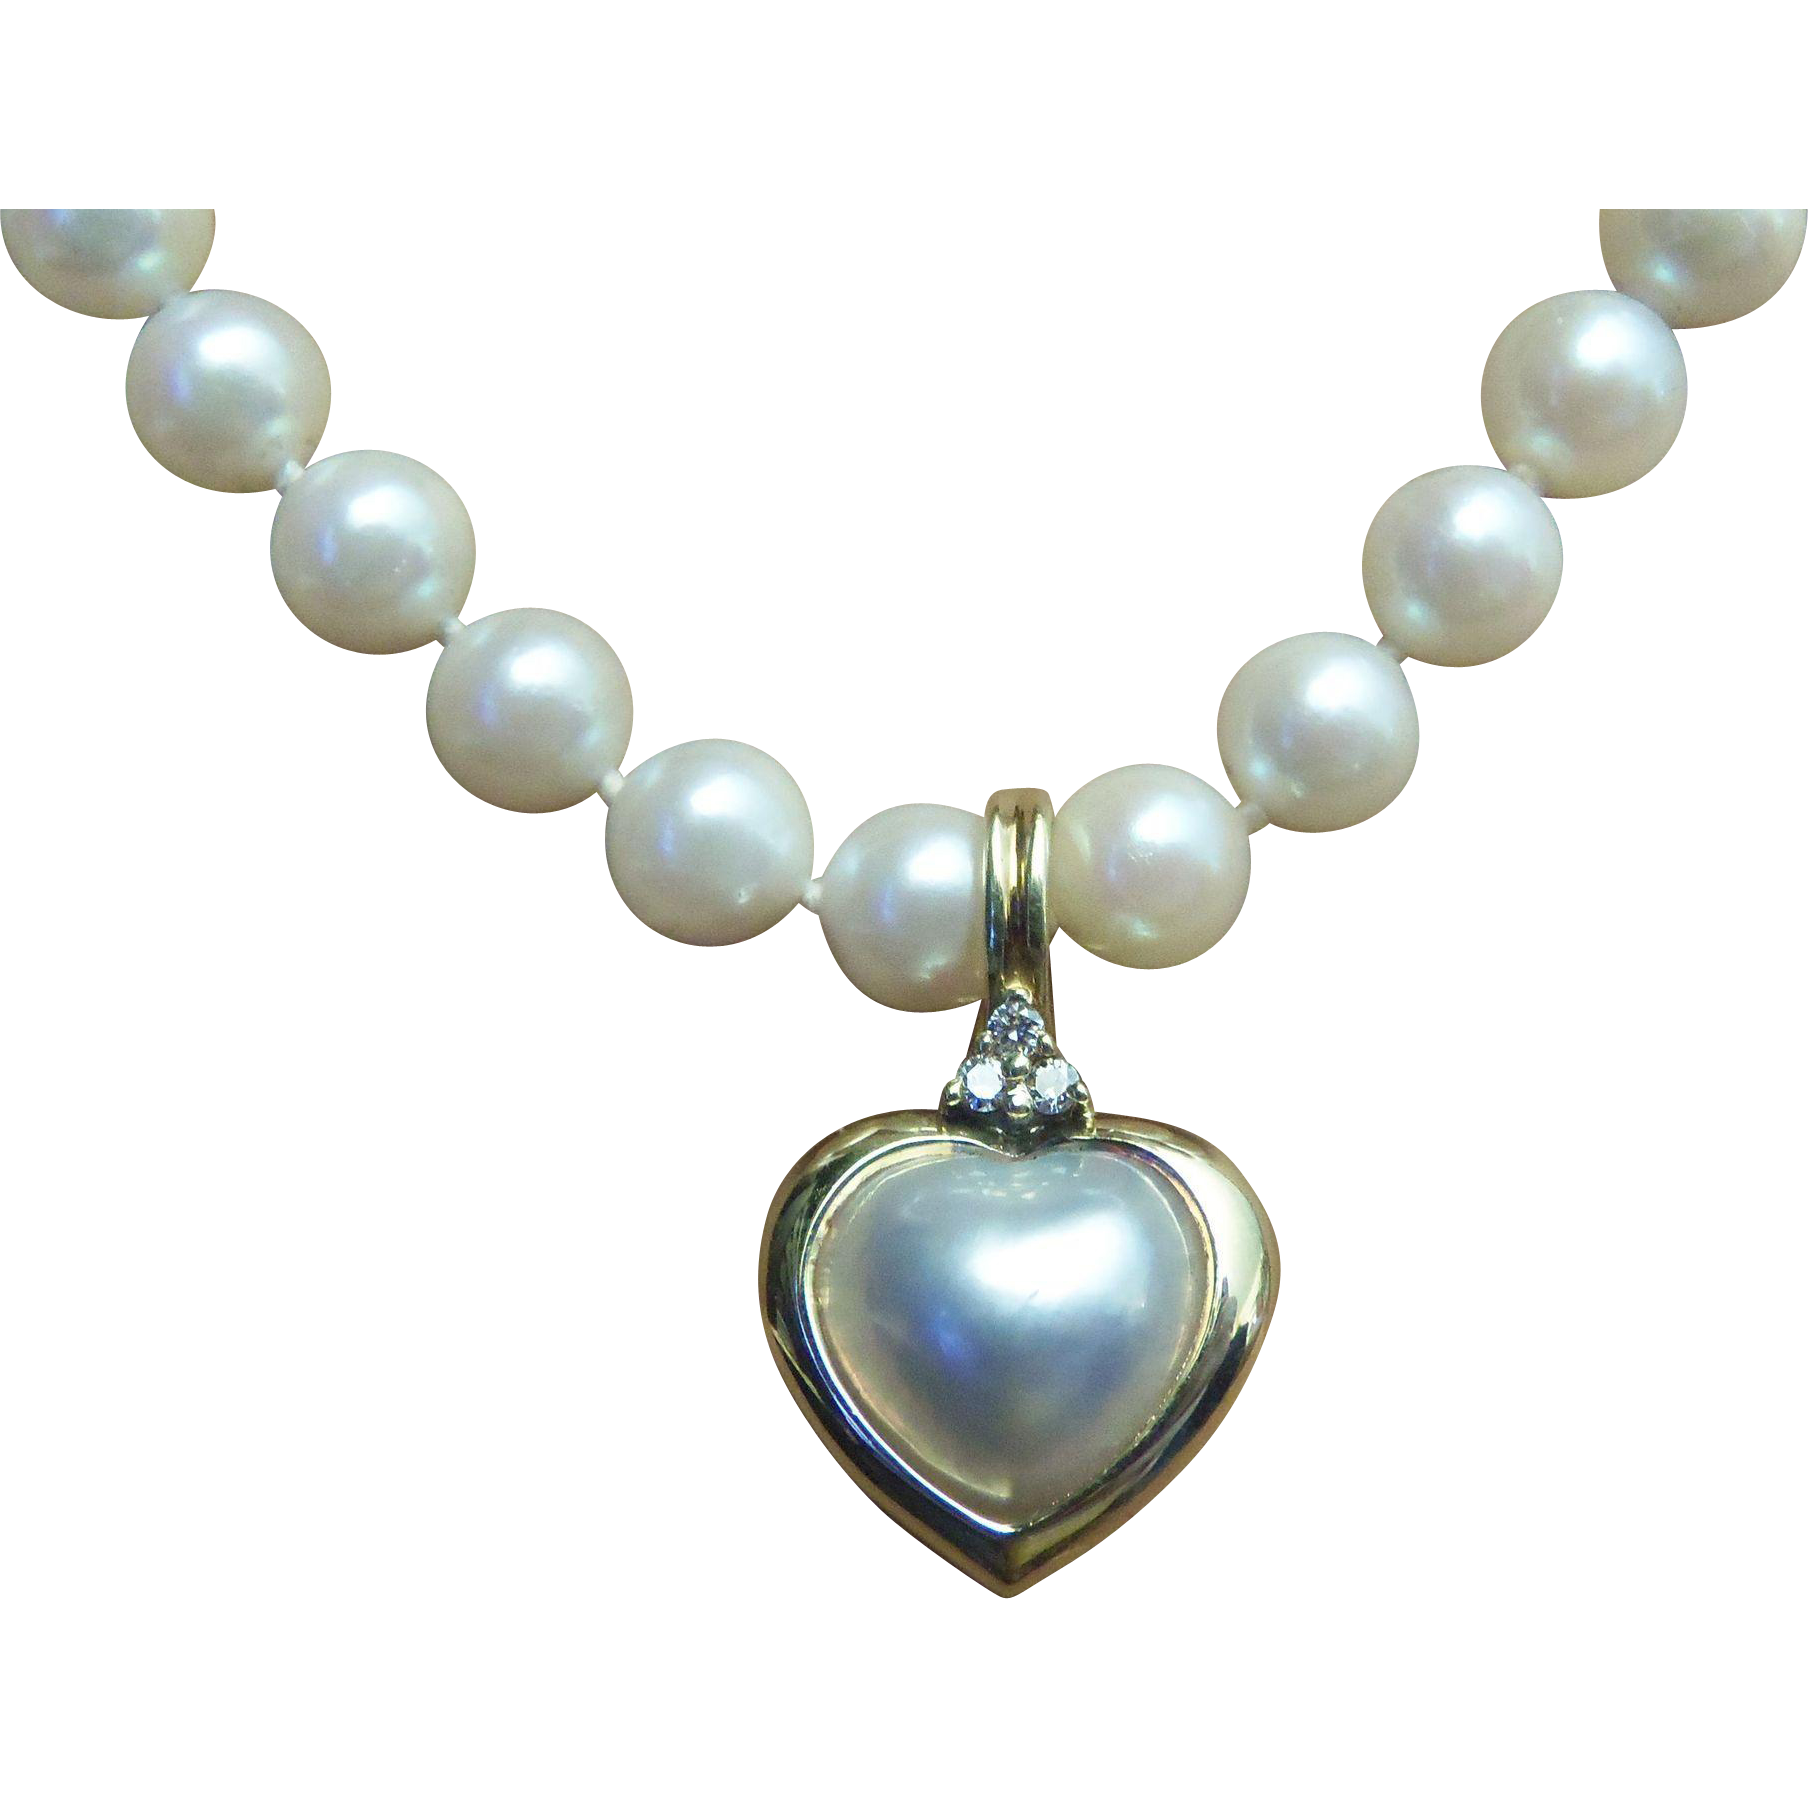 Stunning Estate Elizabeth Locke 18 Karat Mabe Pearl & Diamond Enhancer On A  Gorgeous 18 Inch Pearl Necklace  Red Tag Sale Item